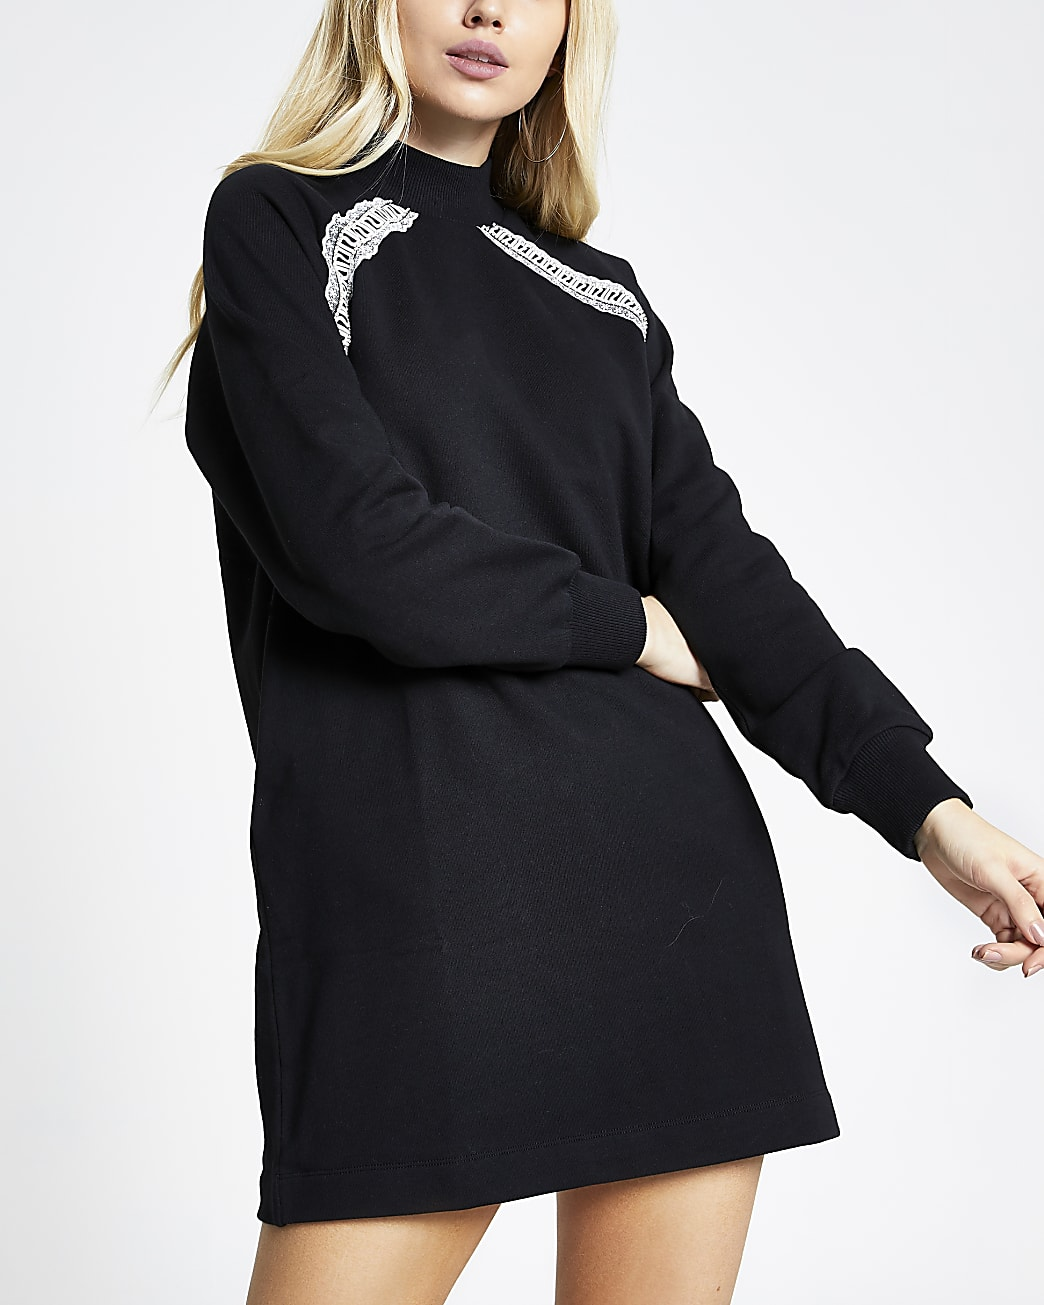 Black RI tape long sleeve sweatshirt dress